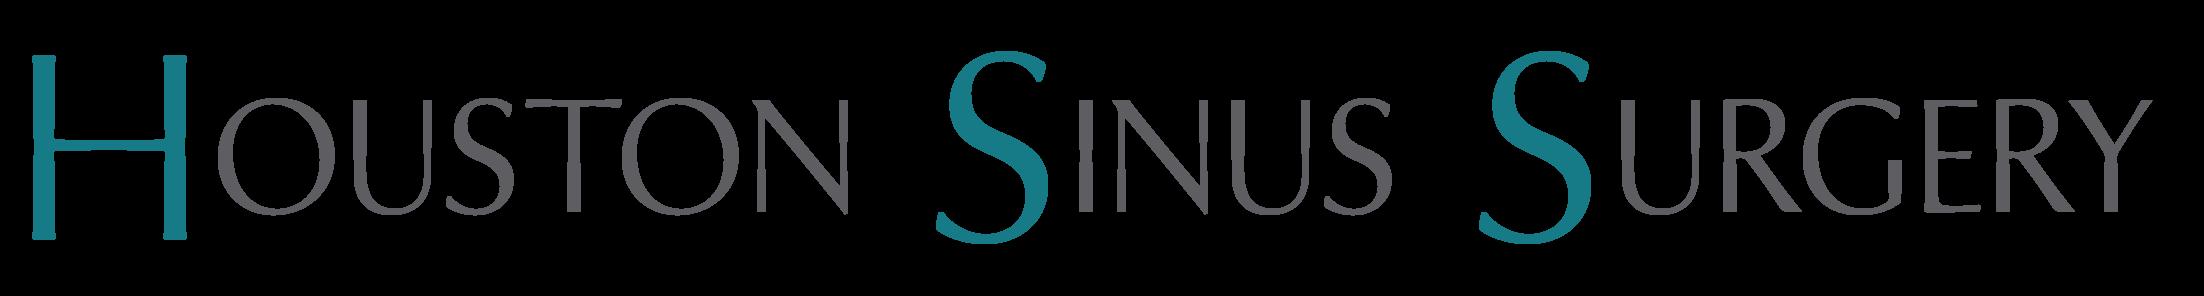 Chronic & Severe Nasal Congestion – Houston Sinus Surgery